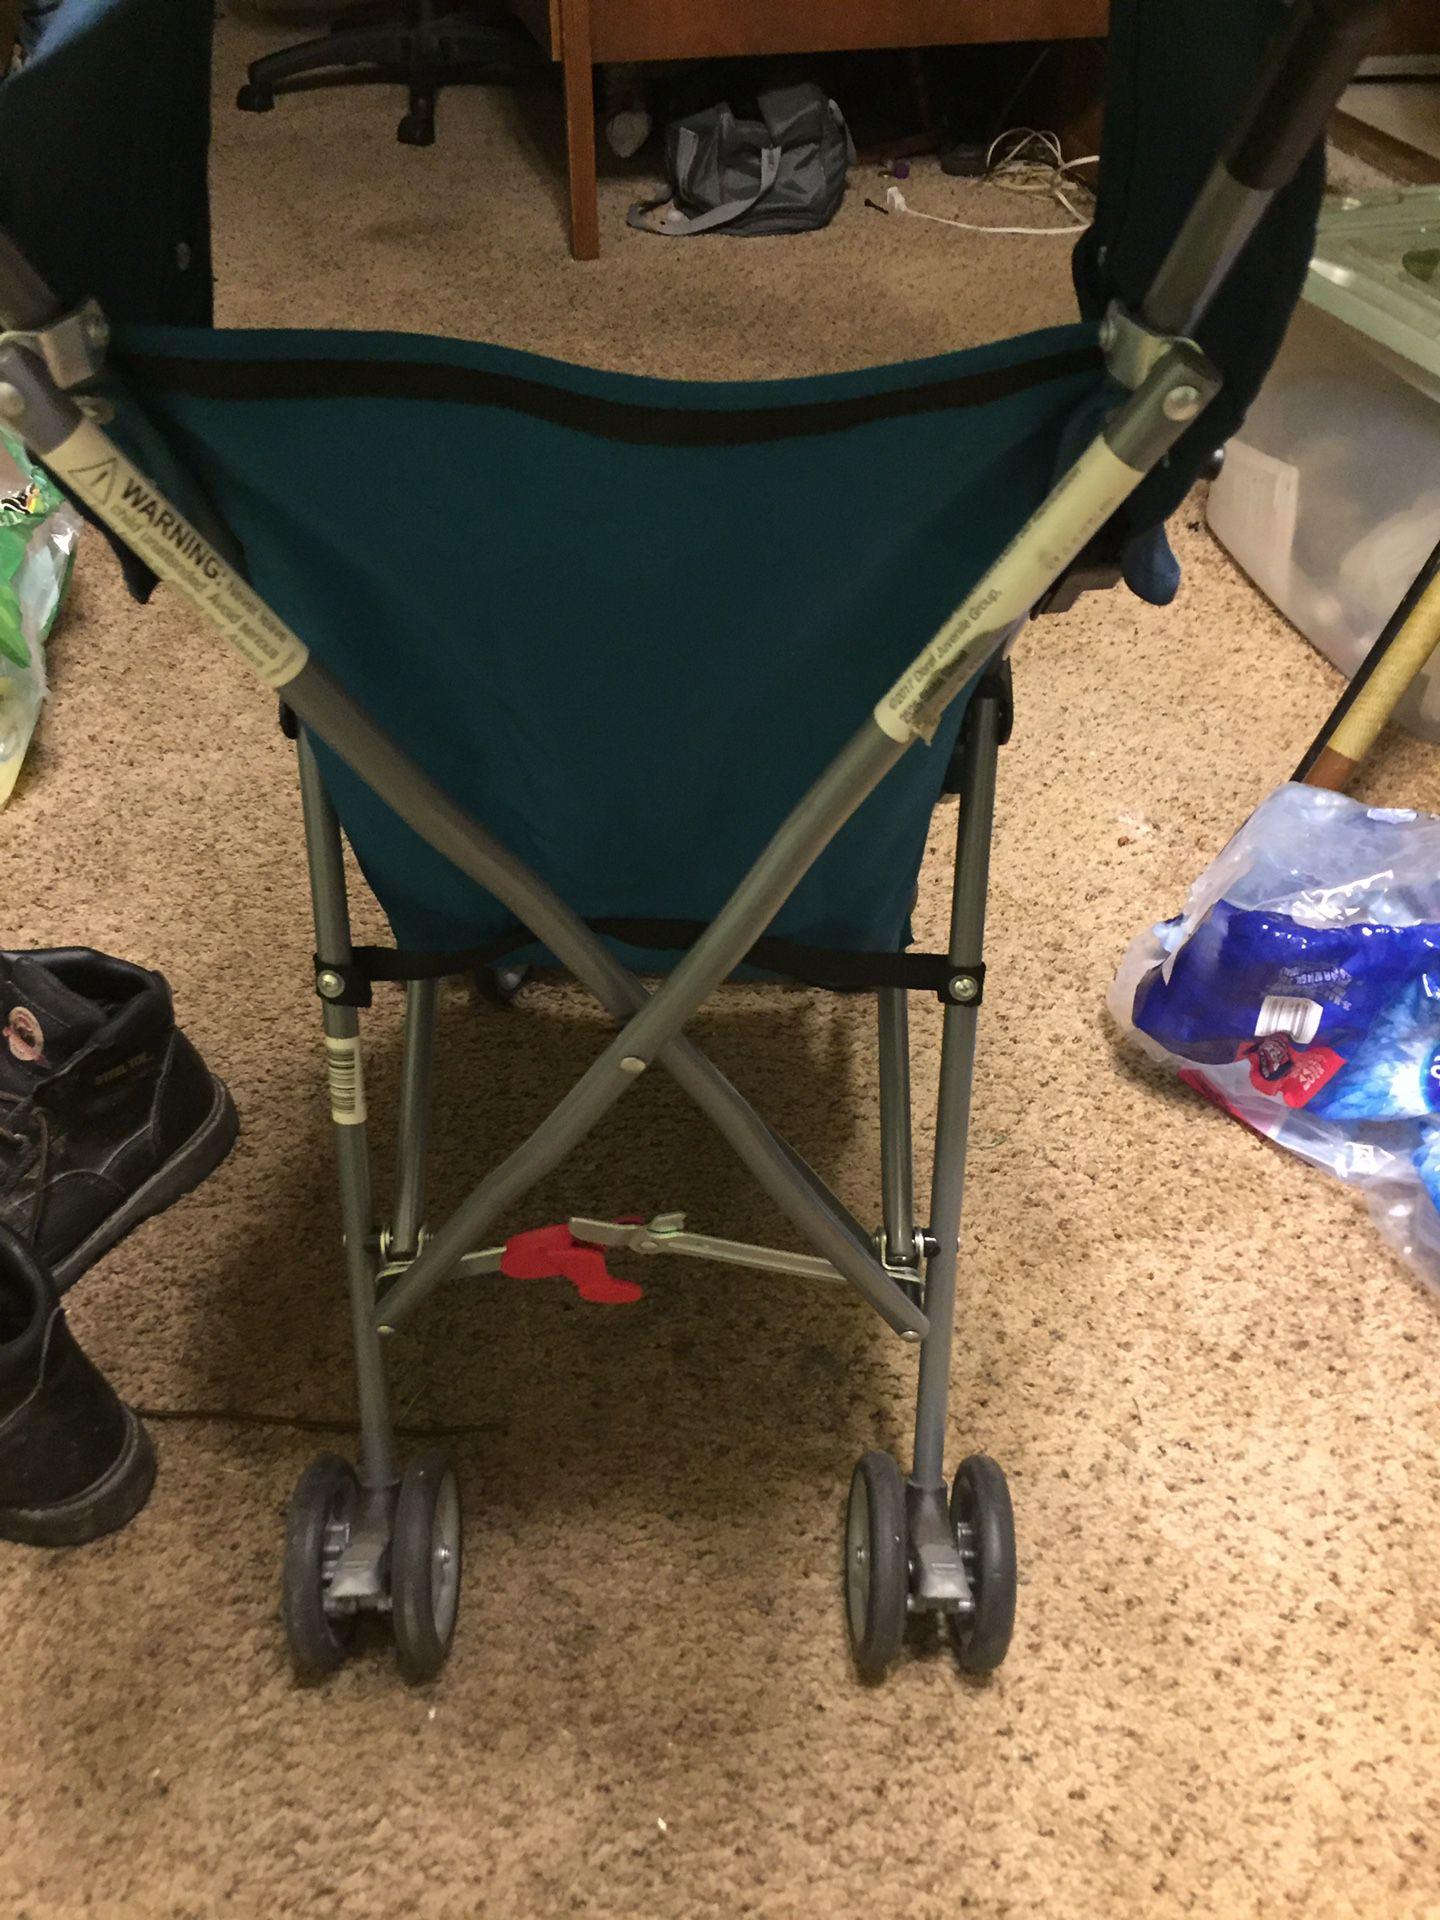 Toddler stroller, pack n play